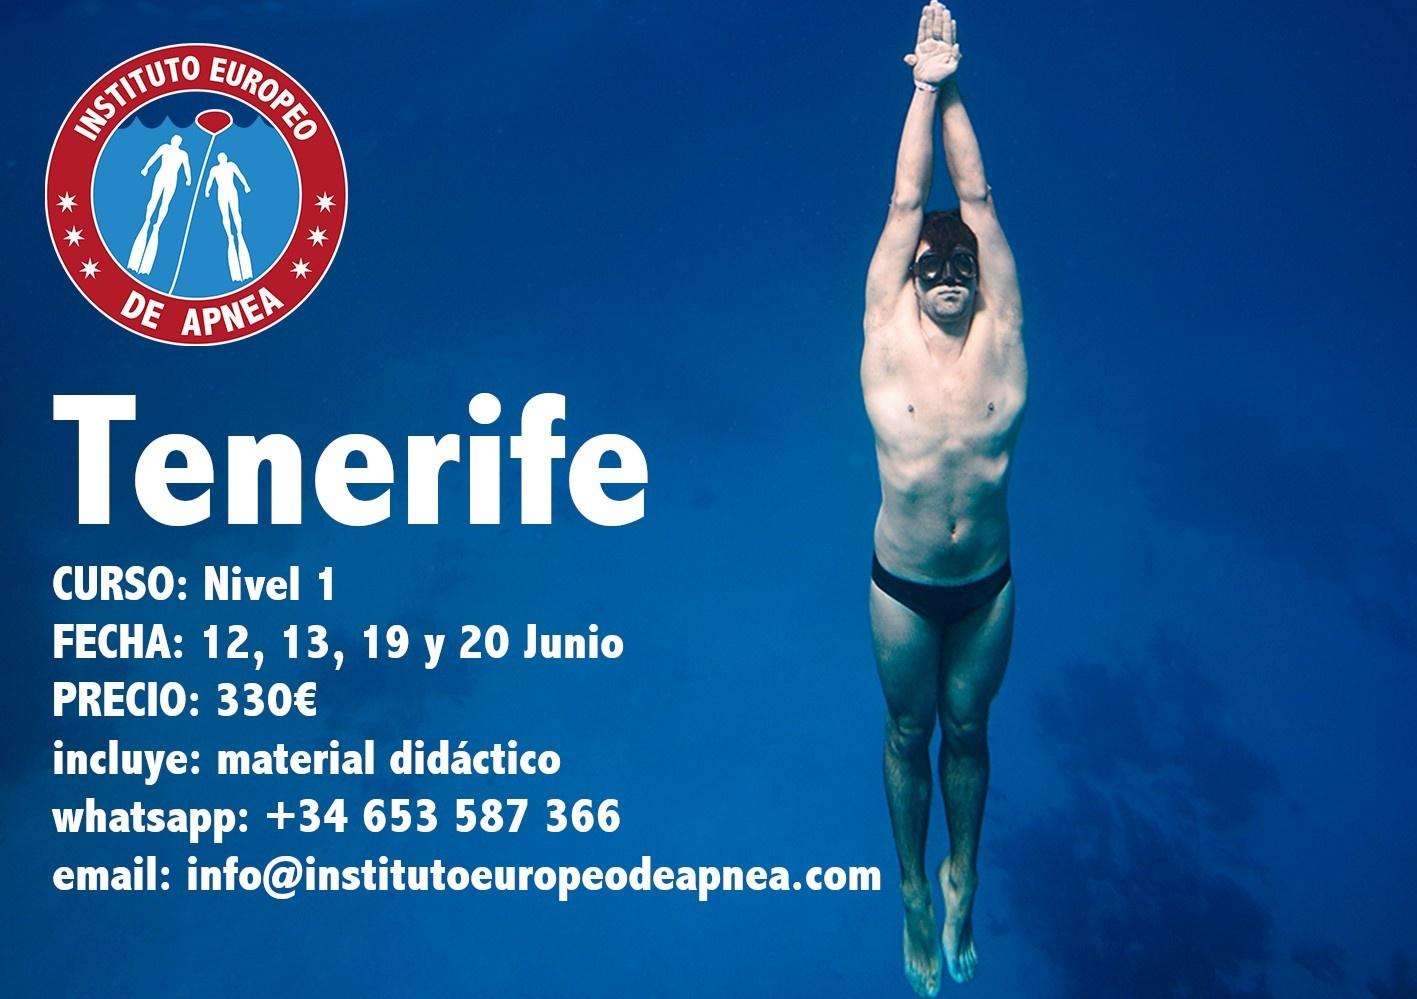 Curso de apnea nivel 1 en Tenerife